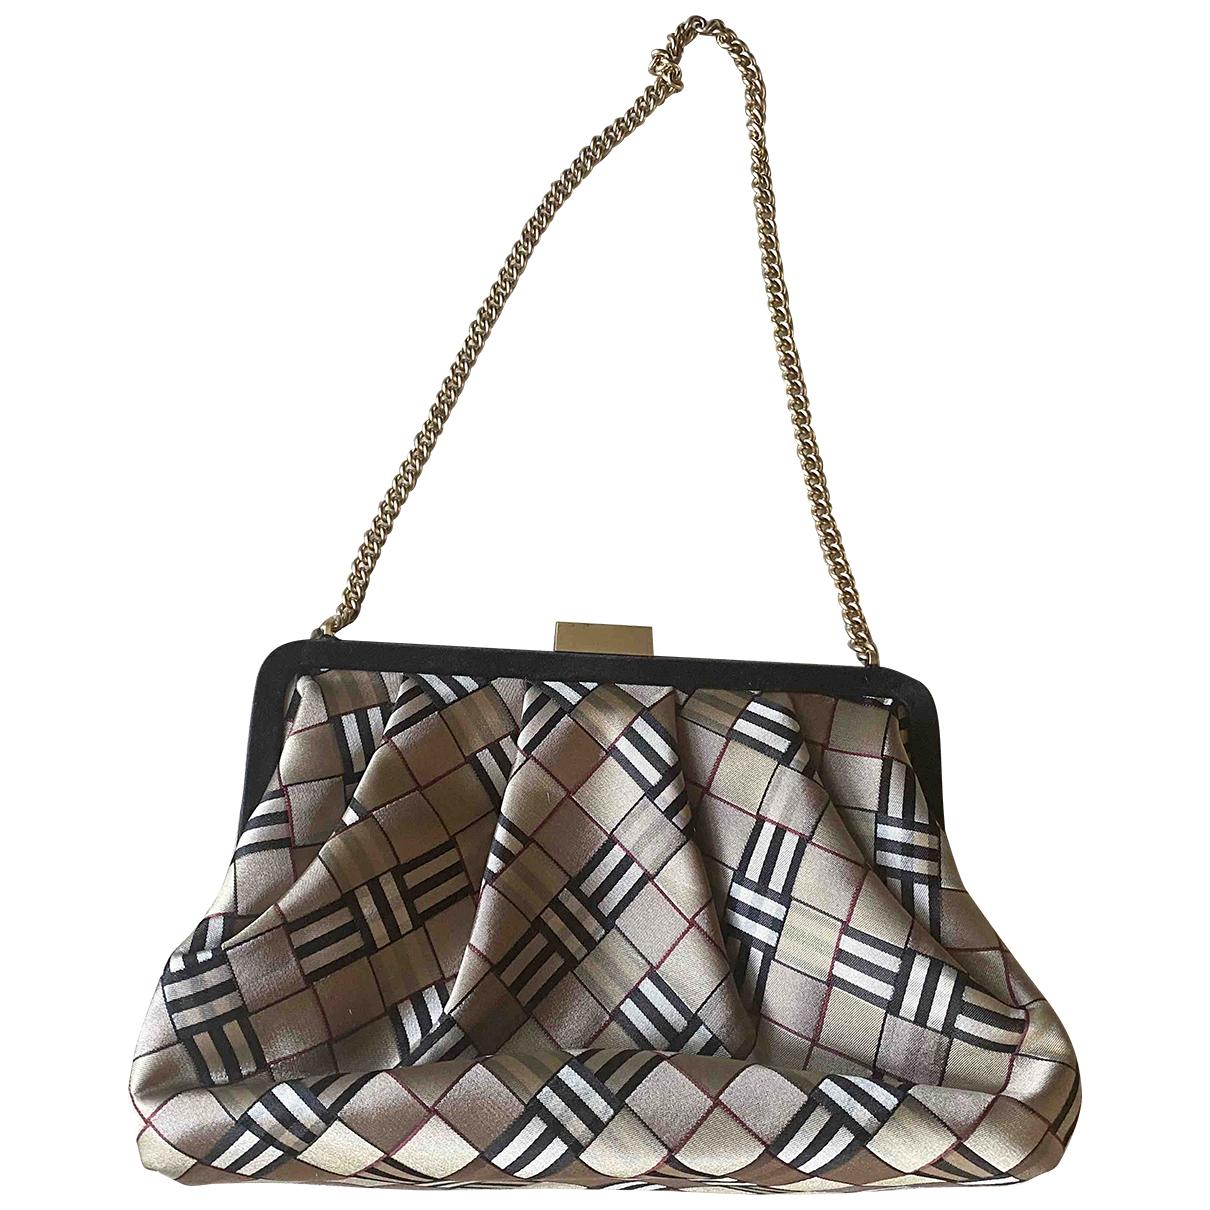 Burberry \N Beige Silk handbag for Women \N